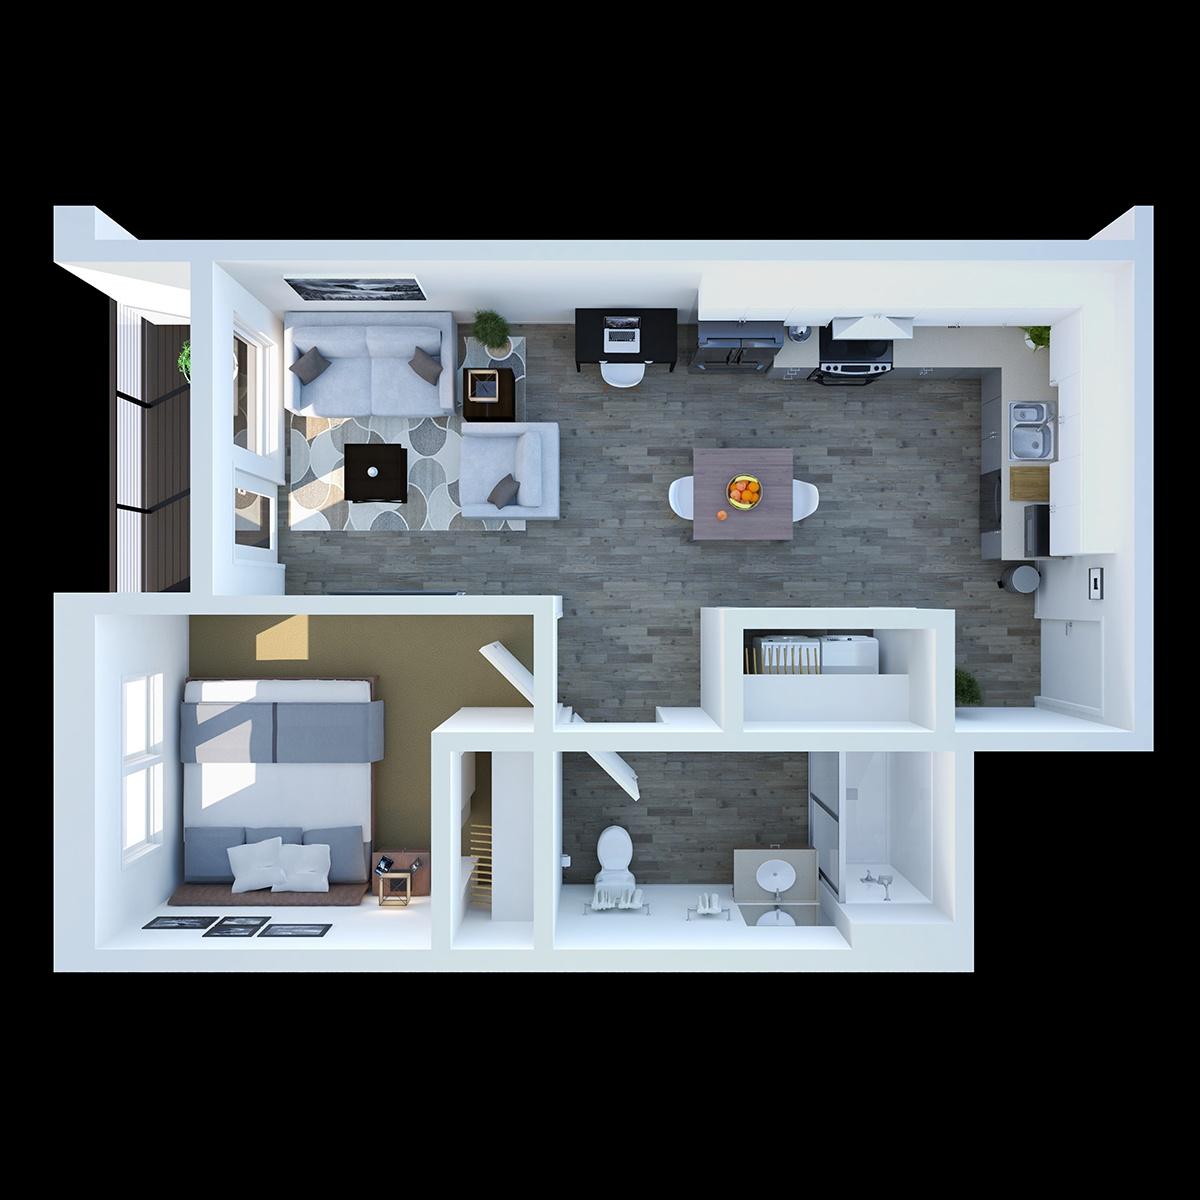 1 BED 3D.jpg